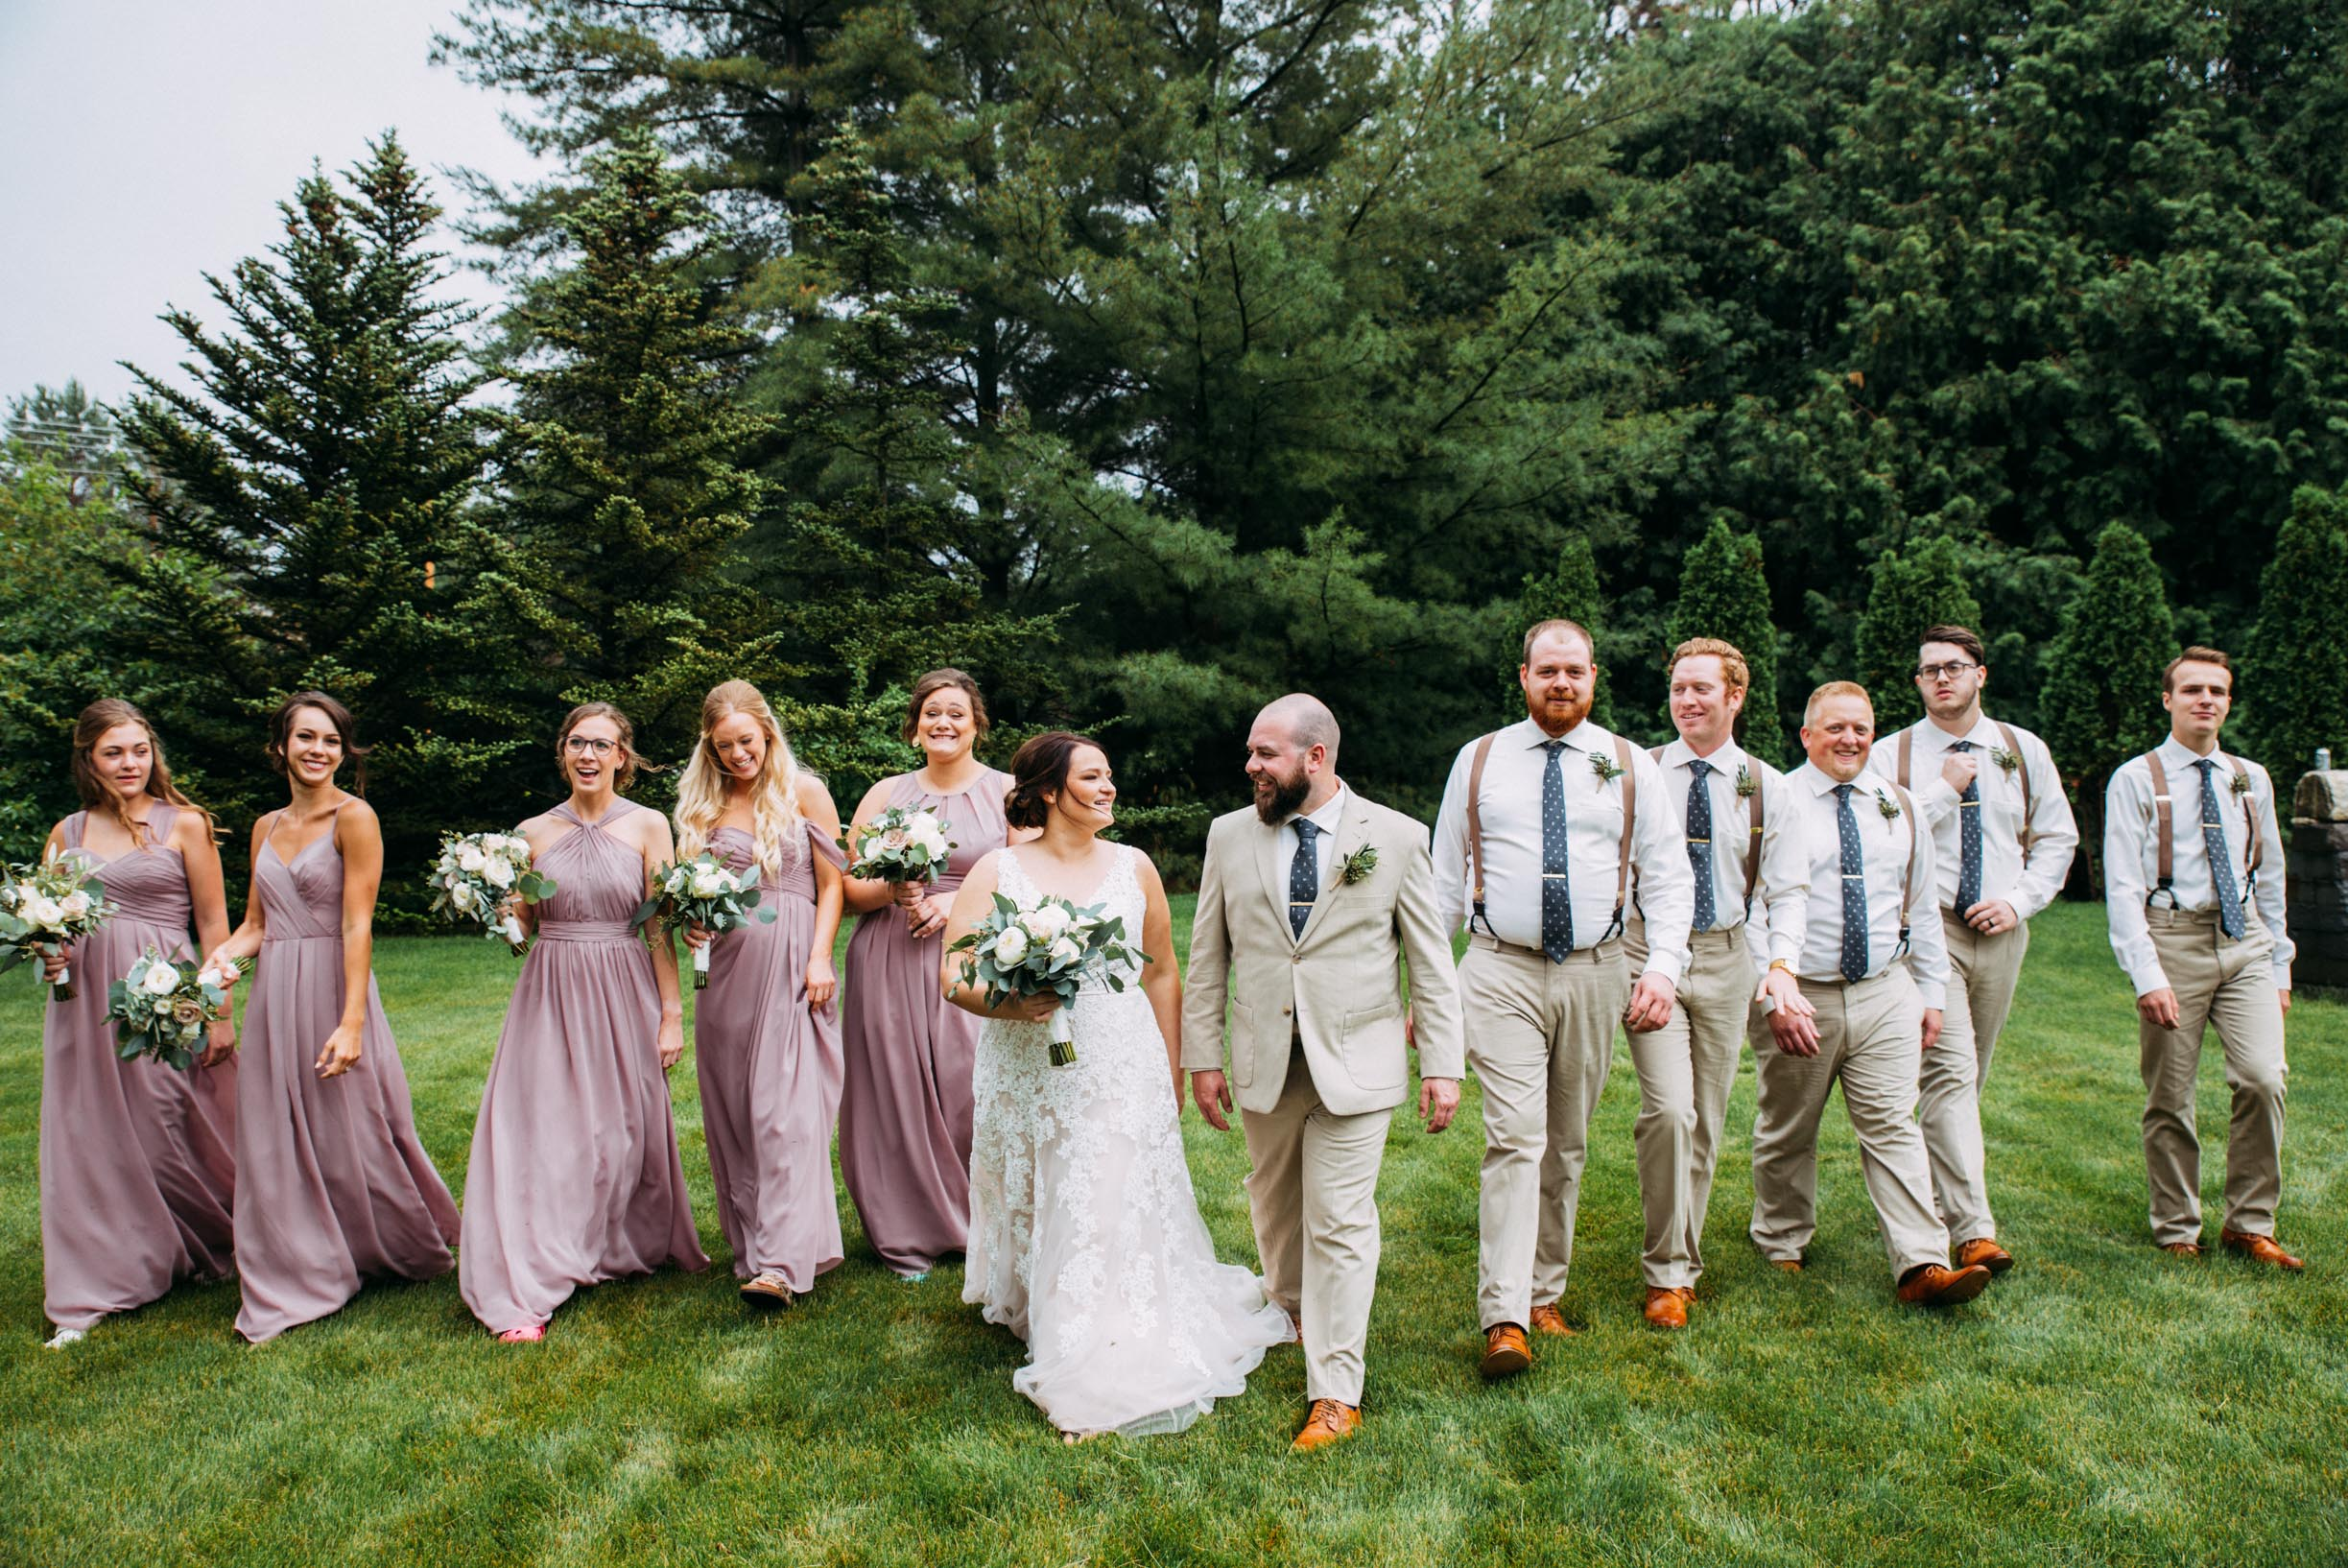 15-Jess_Jeremy_Minnesota_Wedding.jpg